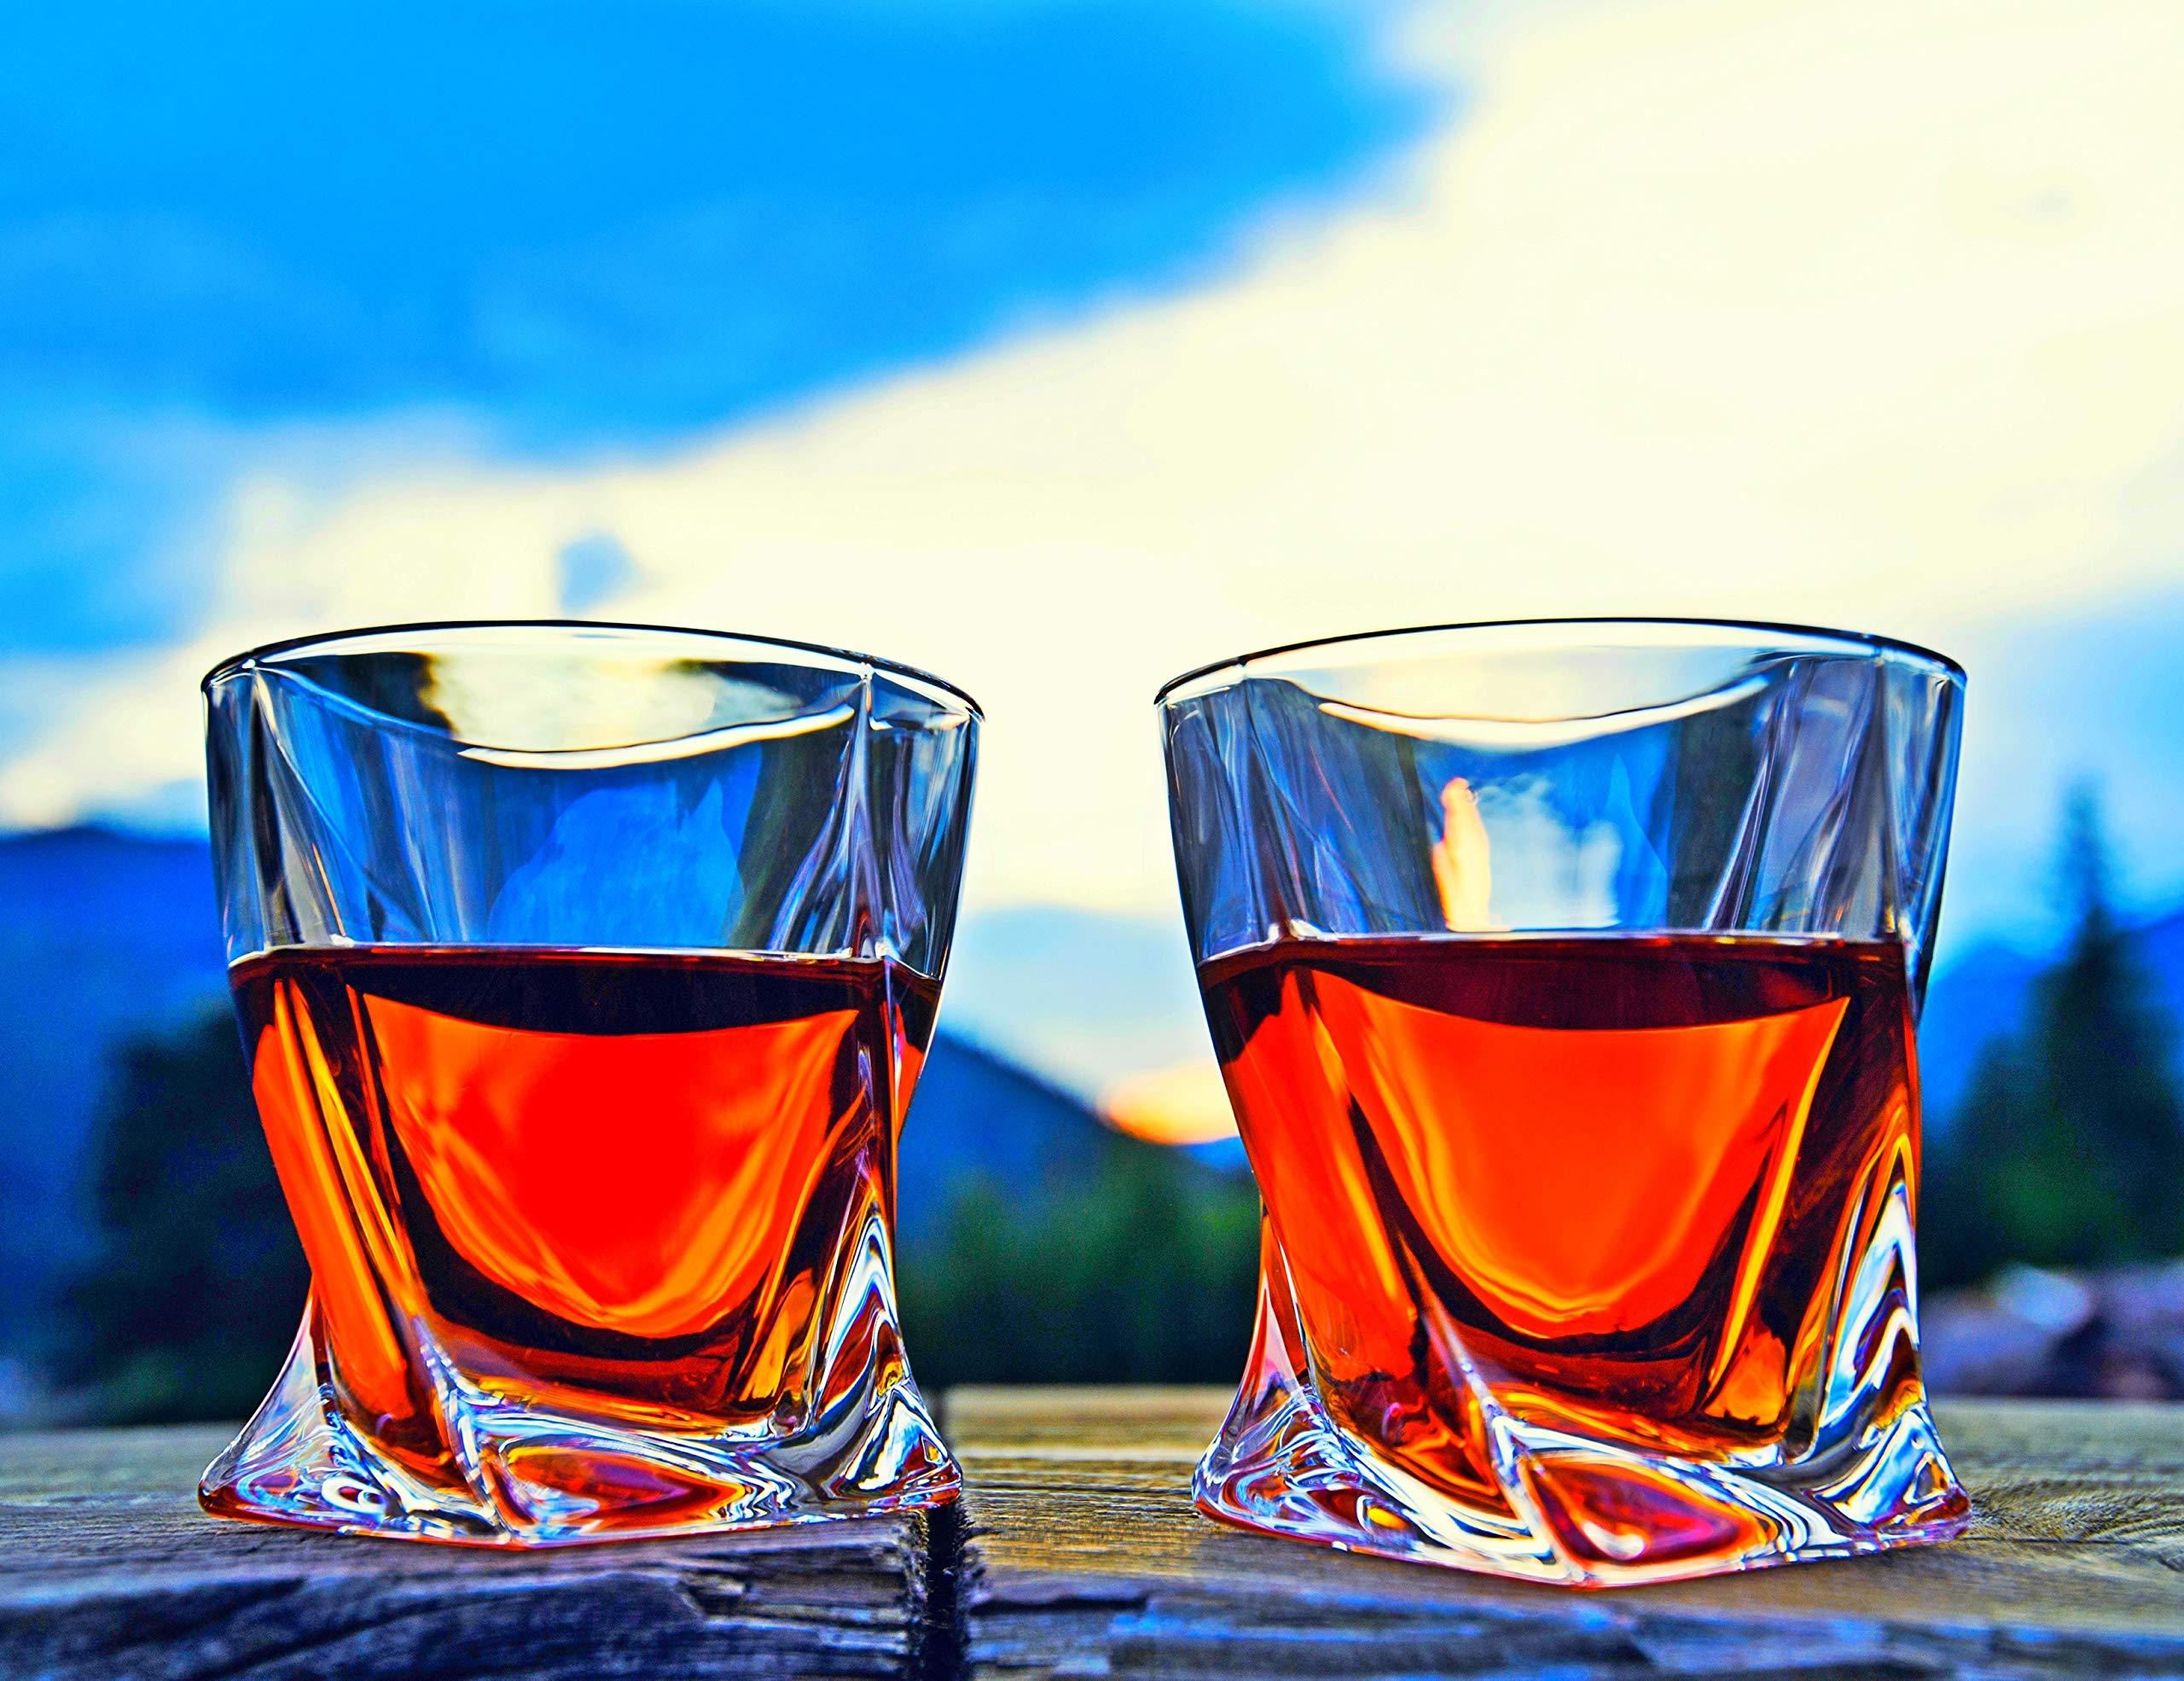 Venero Crystal Whiskey Glasses, Set of 4 Rocks Glasses in Gift Box – Lowball Bar Glasses for Drinking Bourbon, Scotch…